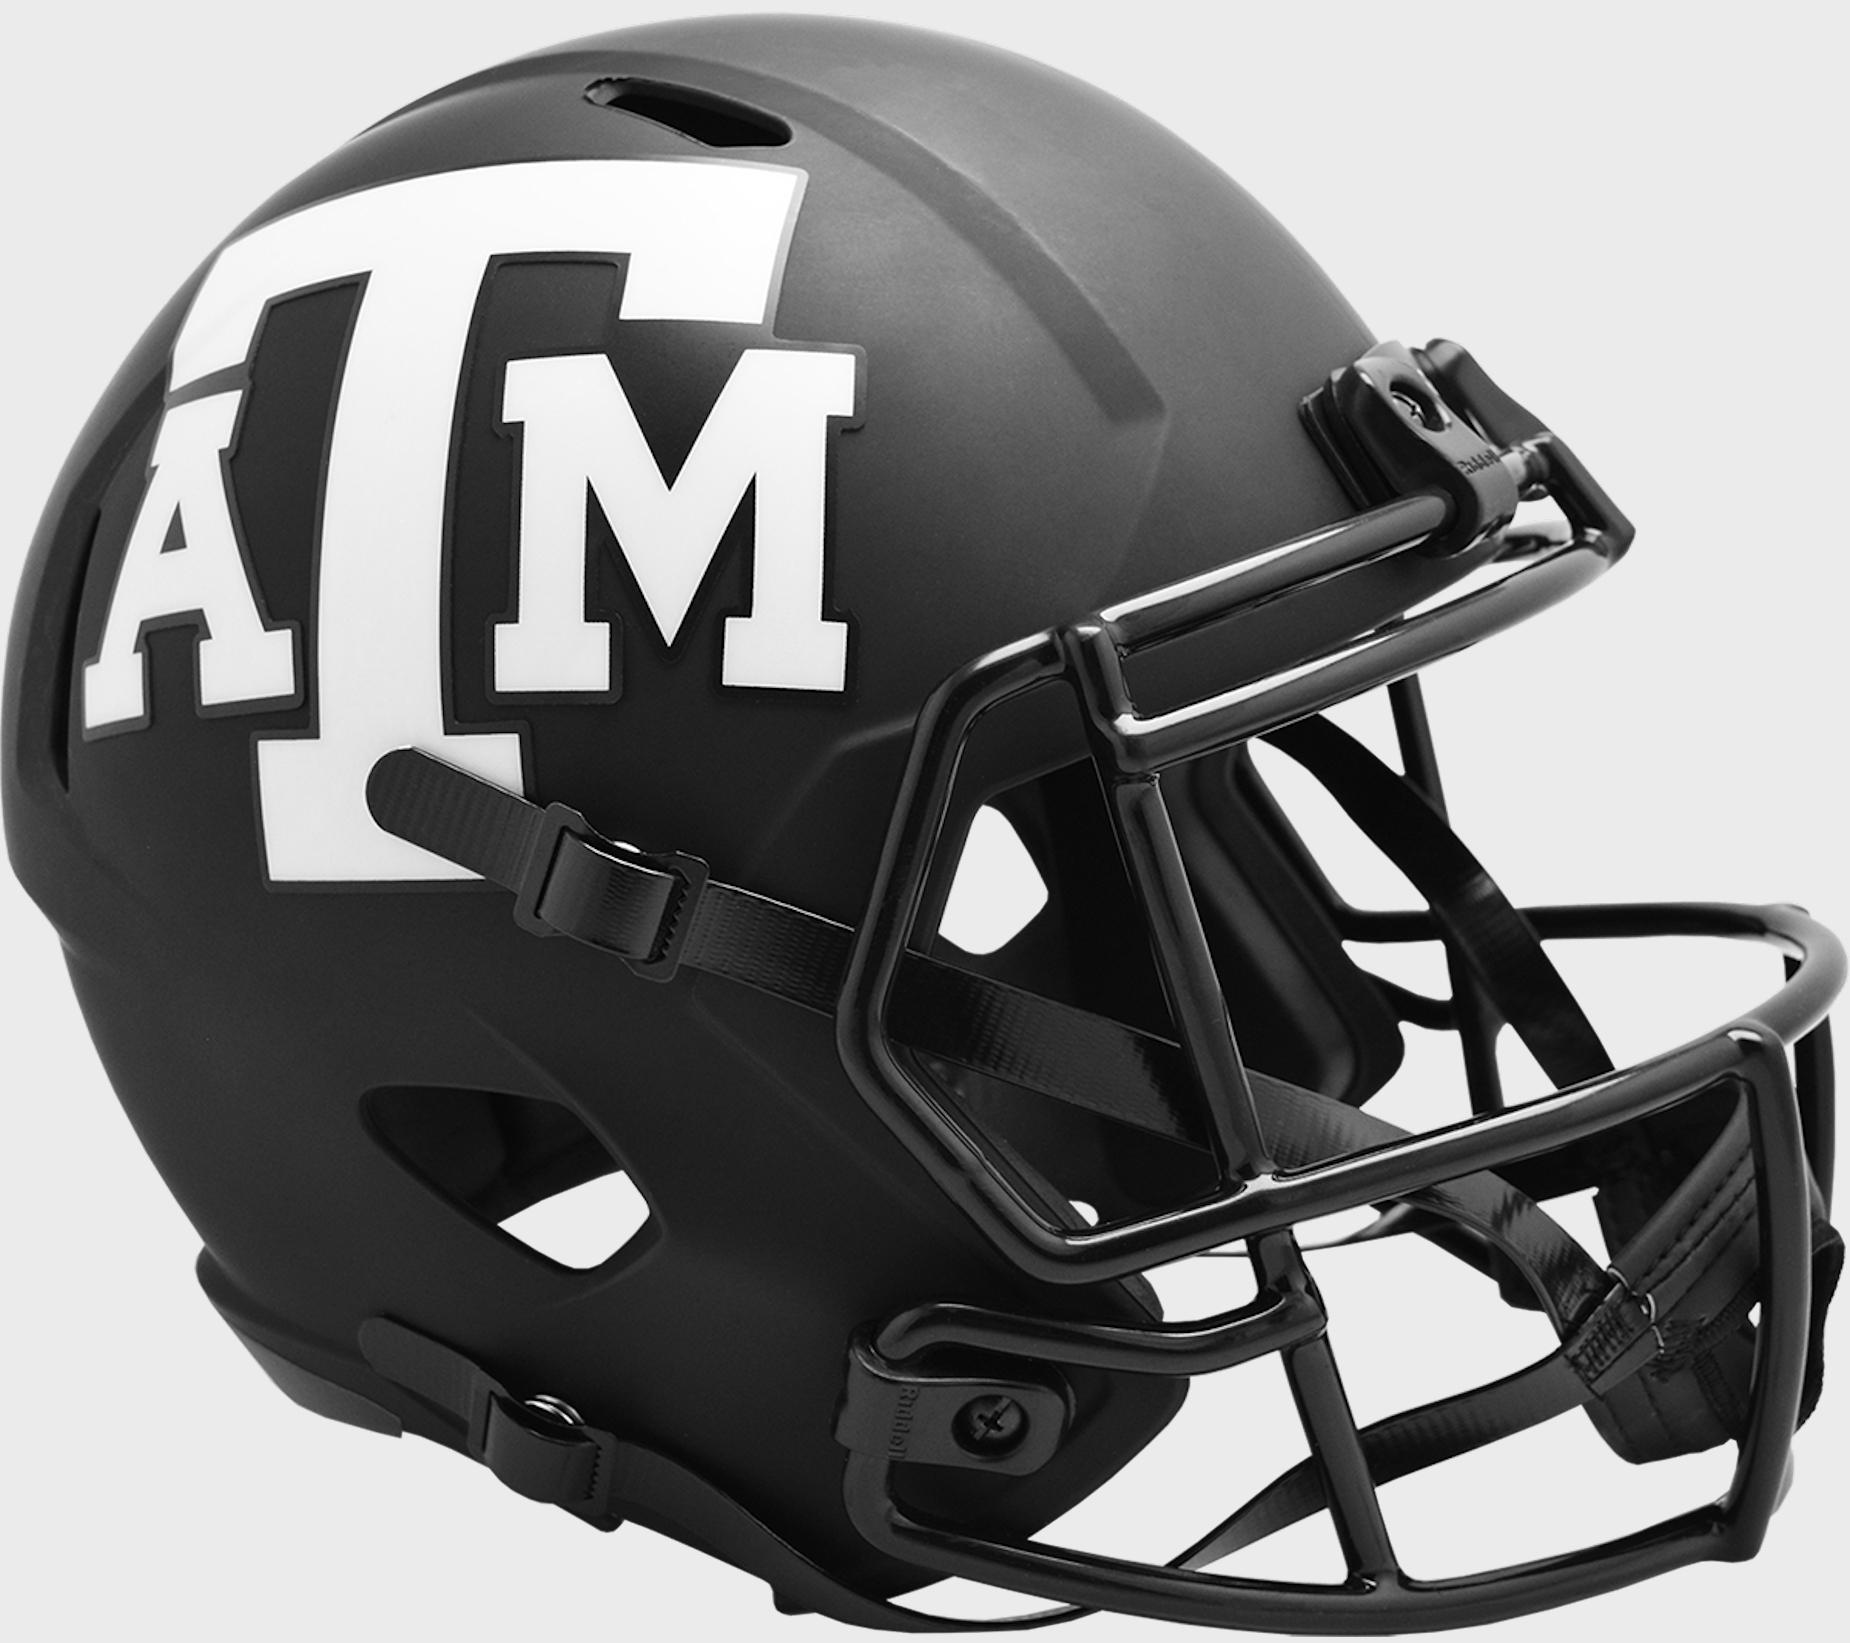 Texas A&M Aggies Speed Replica Football Helmet <B>ECLIPSE </B>